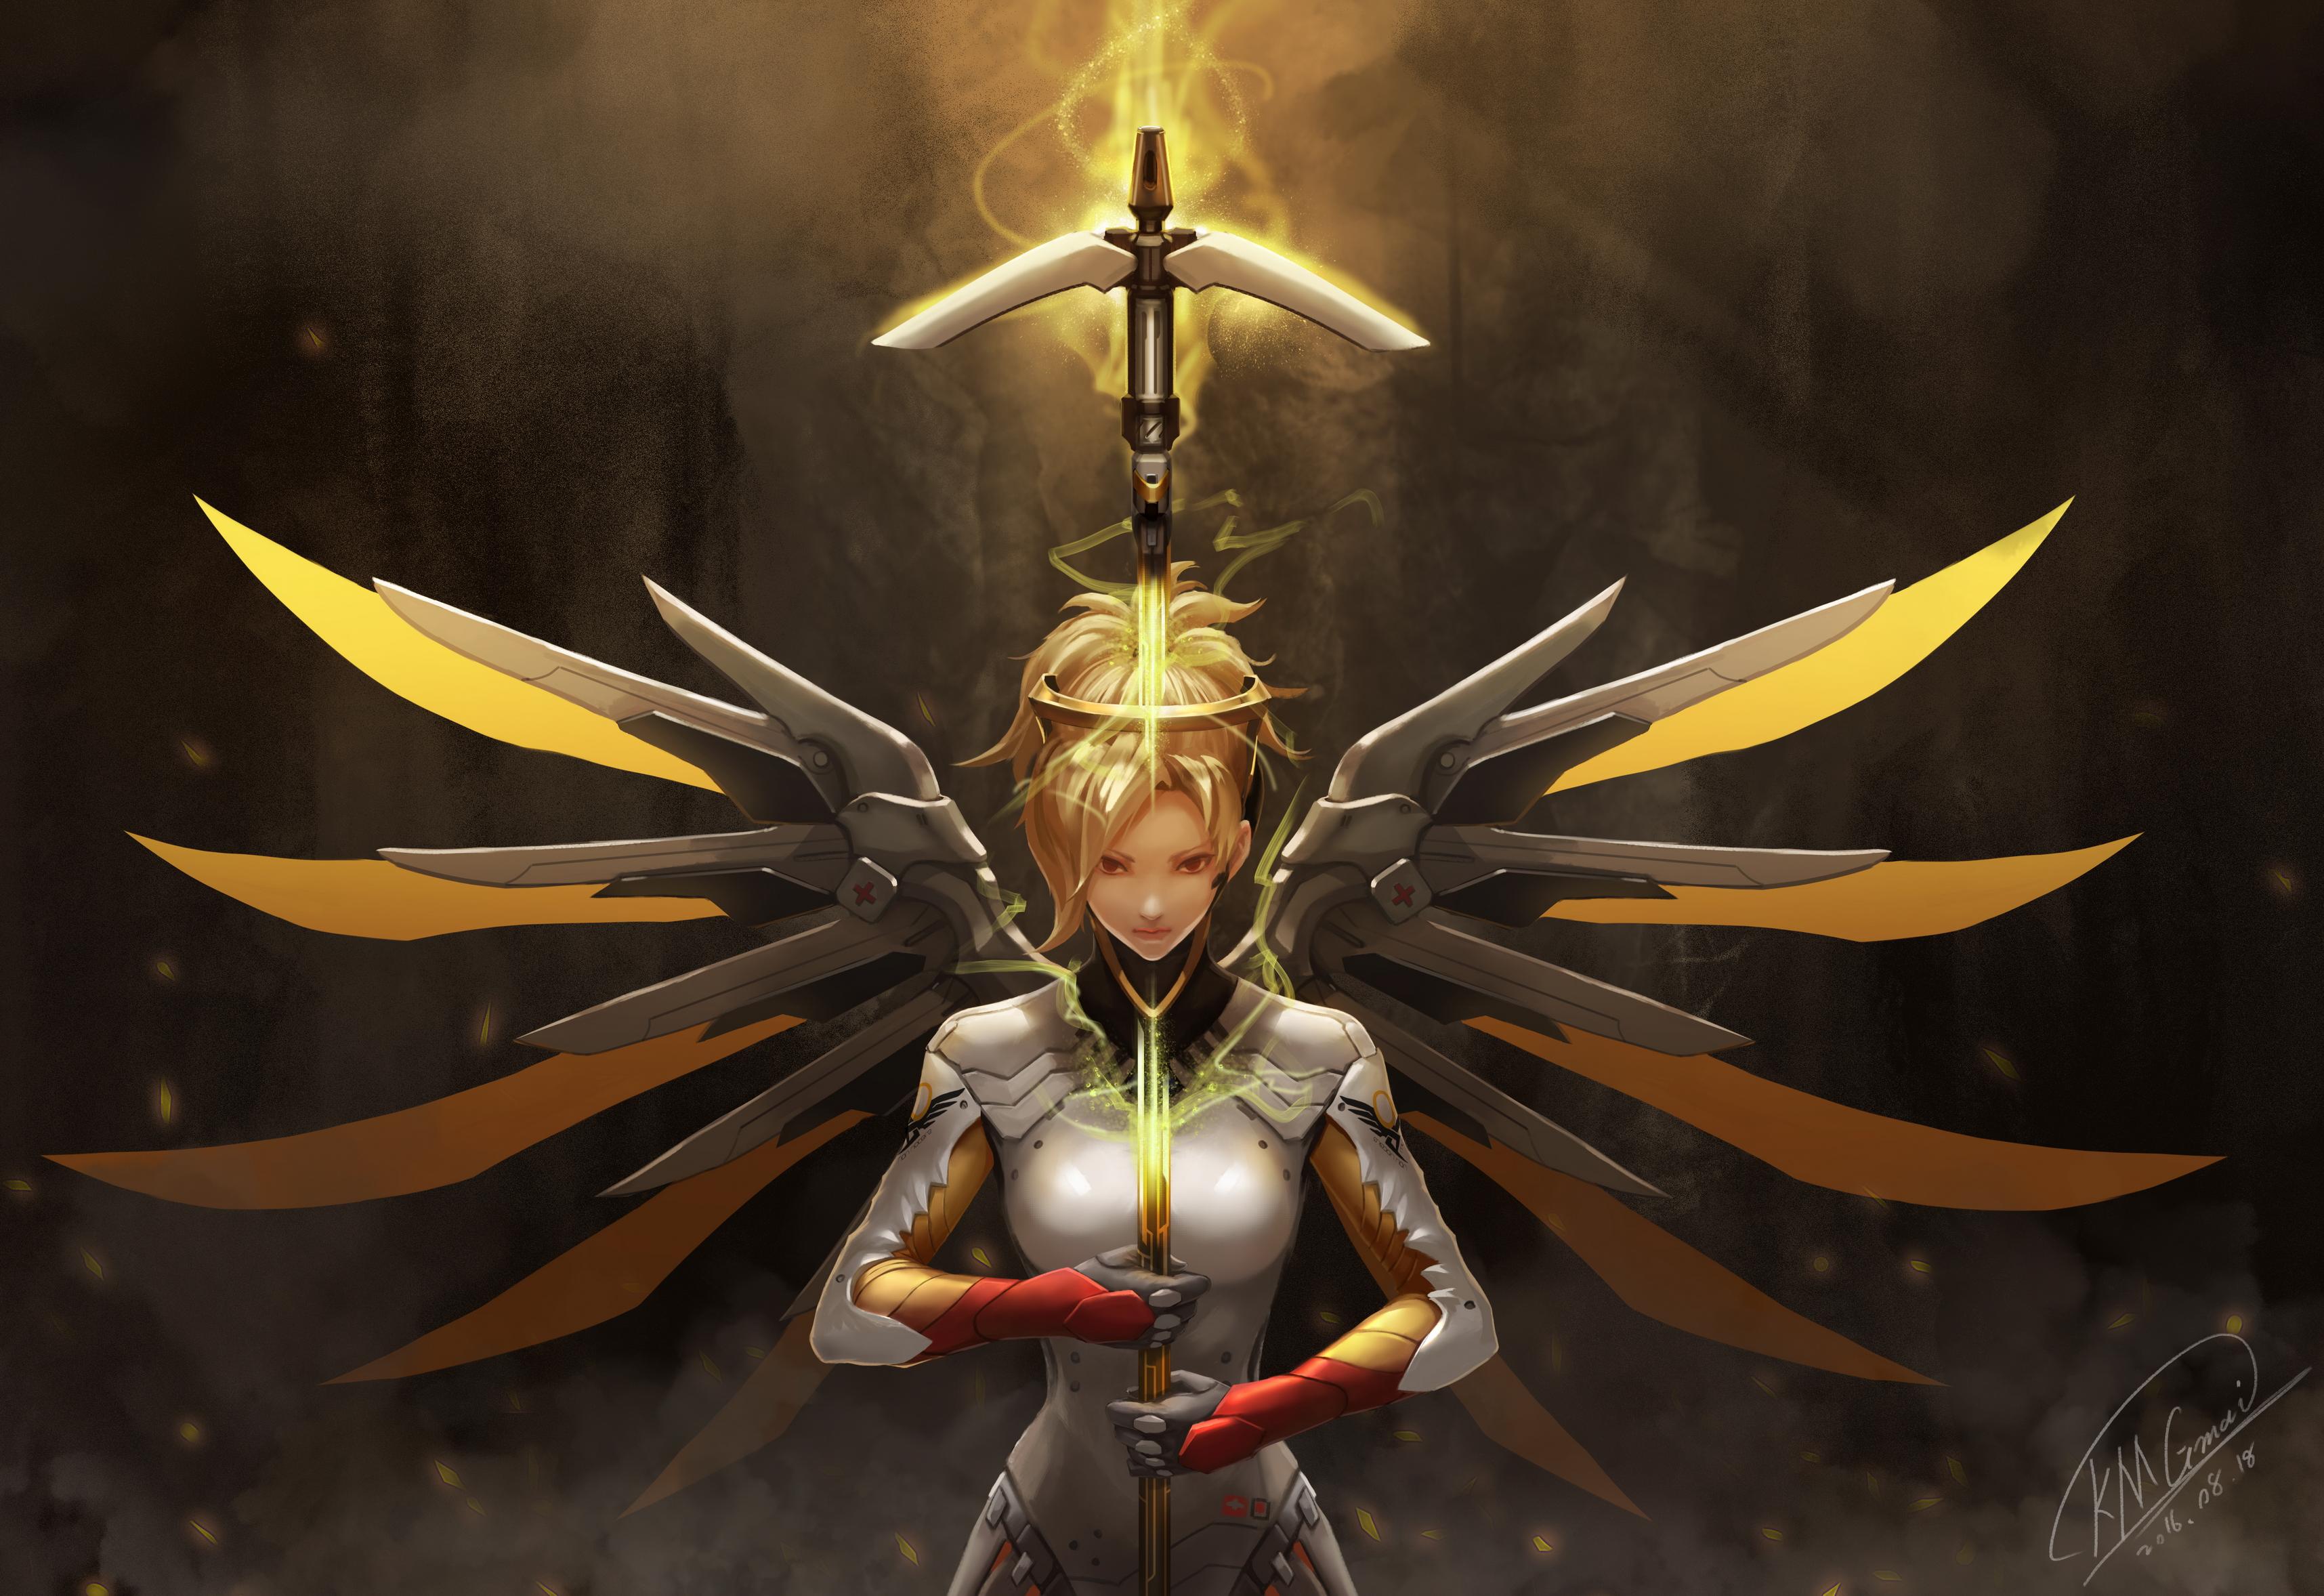 Ceadeus Mercy HD Wallpaper Background Image 3431x2356 ID 3431x2356